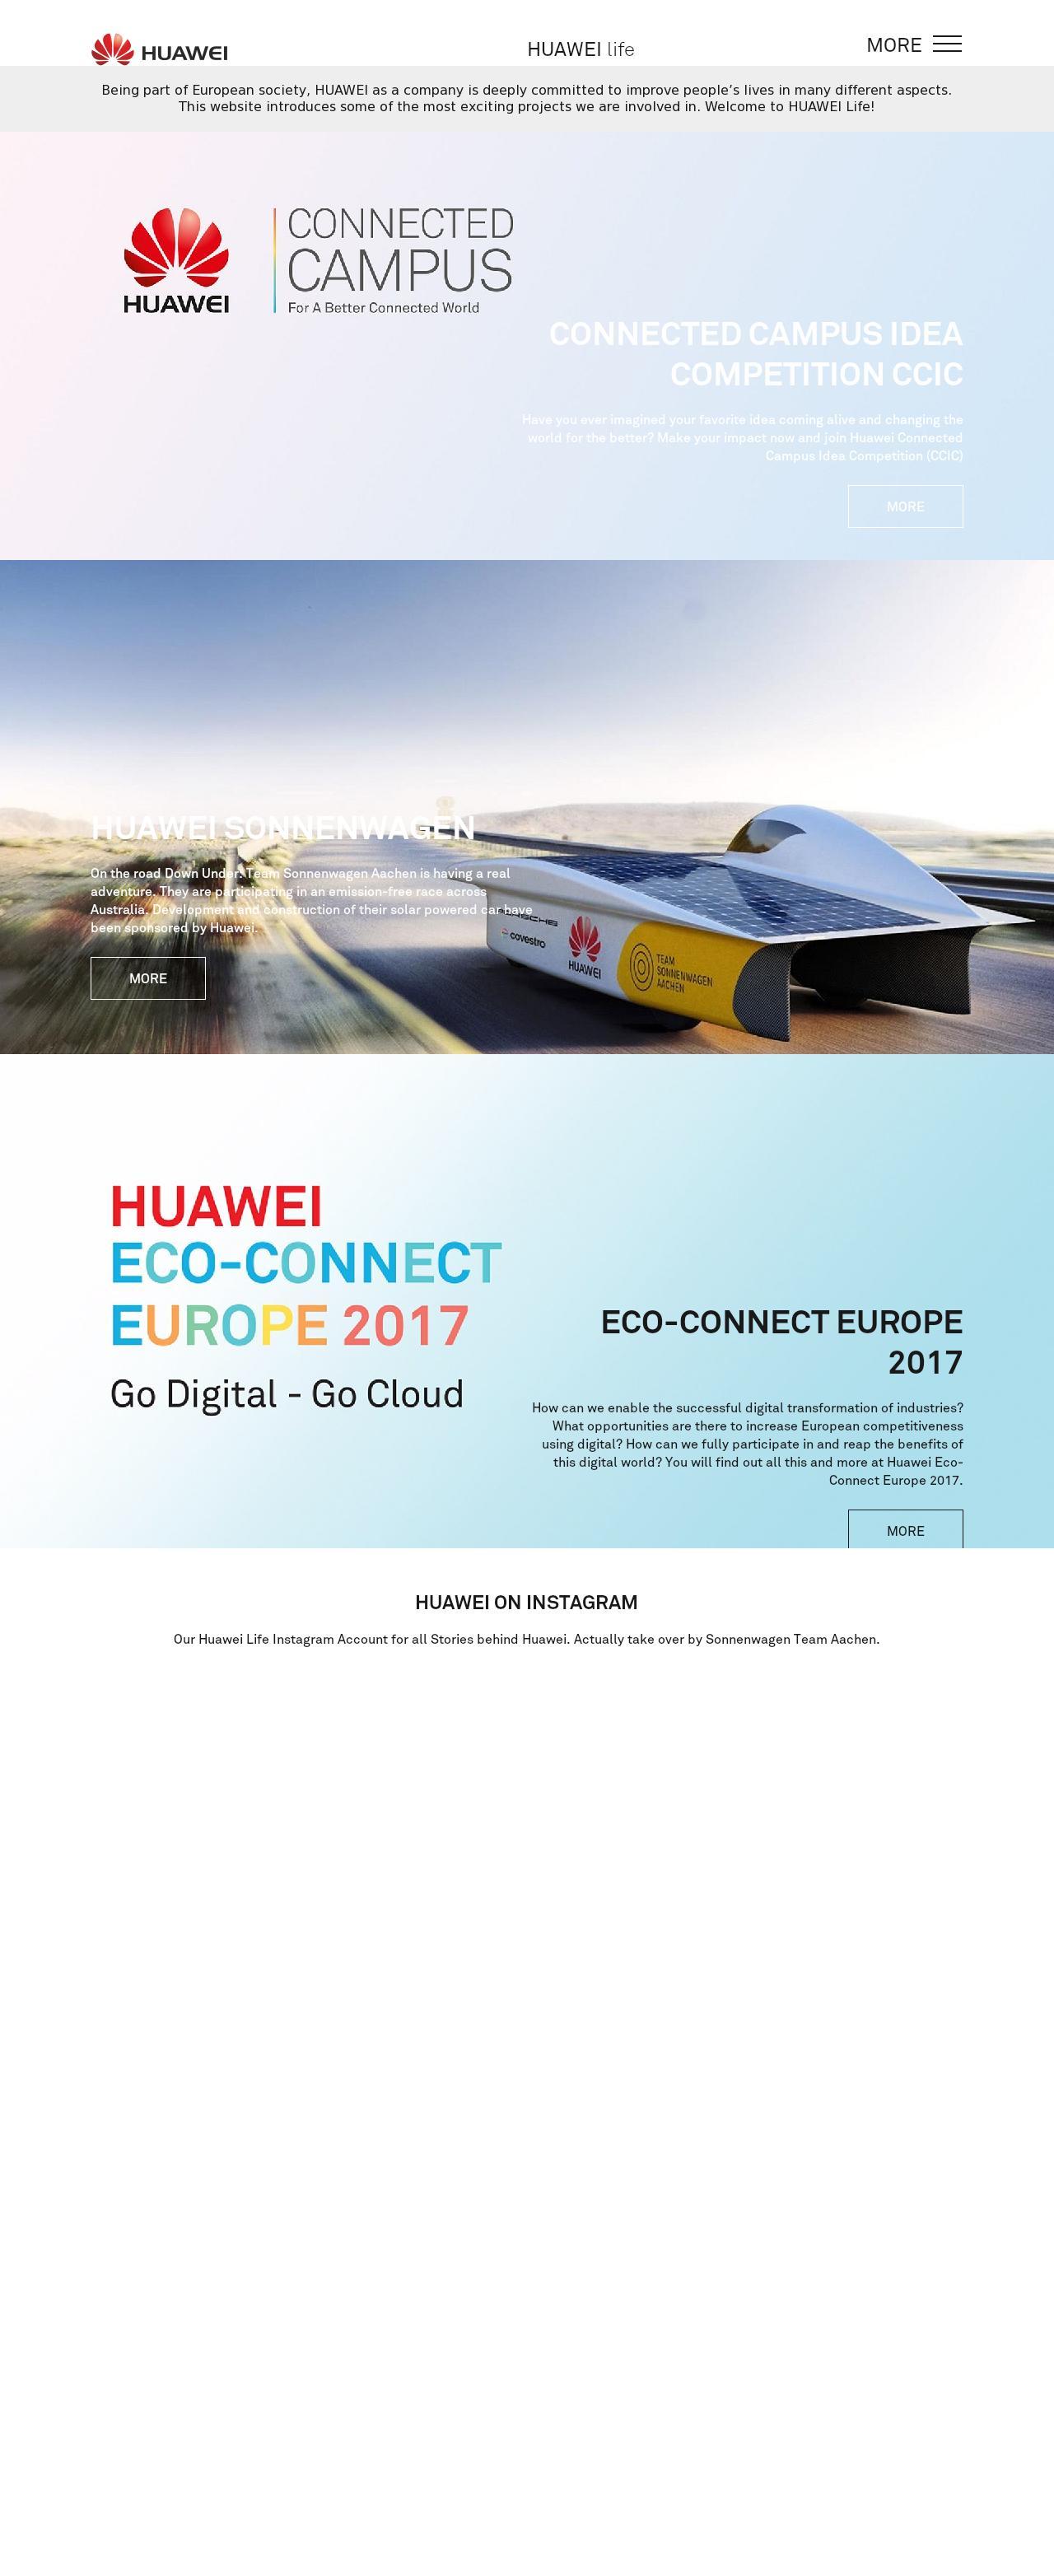 Huawei life